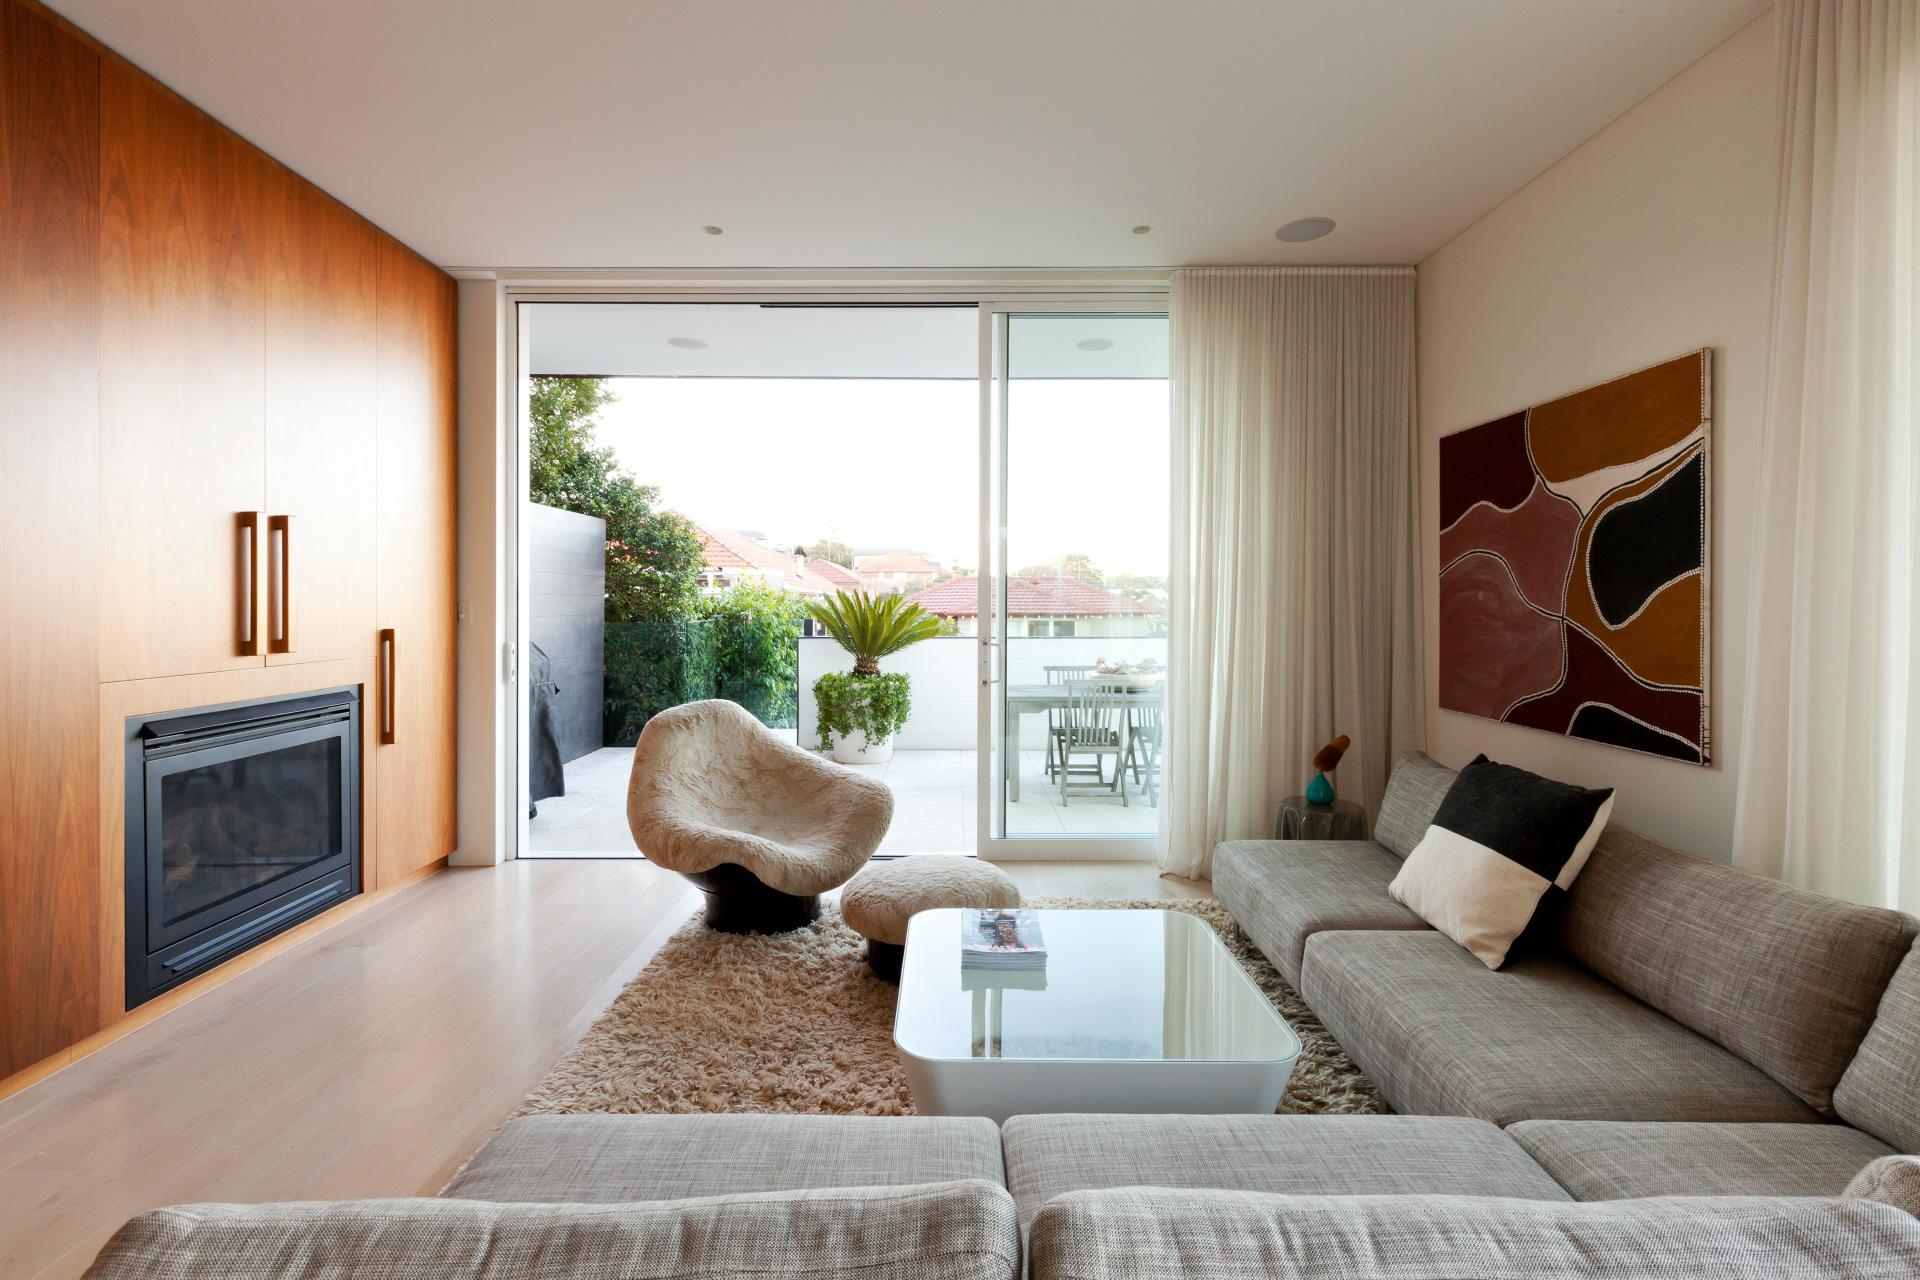 Completed in collaboration with Annie Benjamin Interior Design  http://anniebenjamin.com.au/